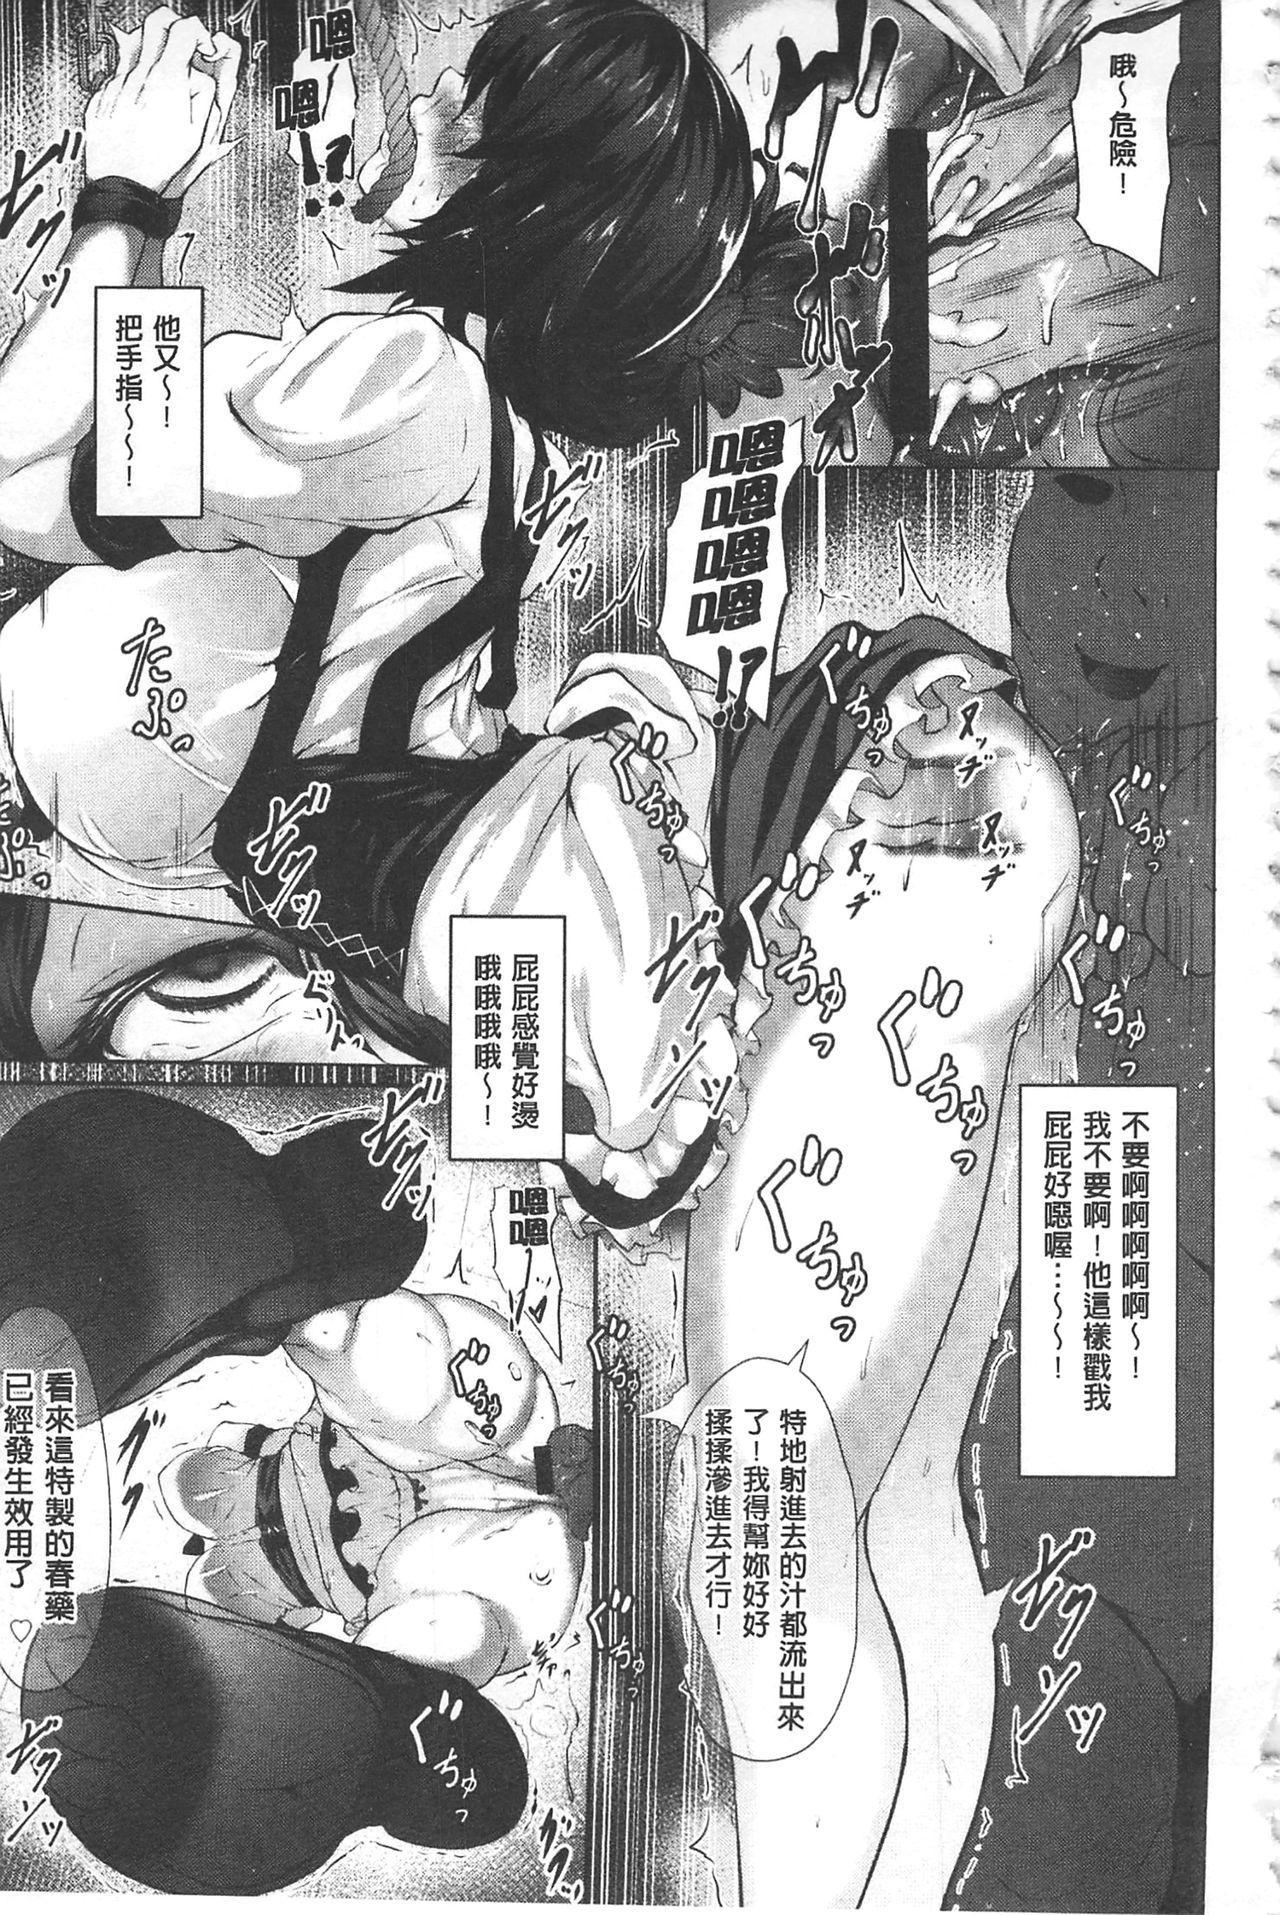 [Lorica] Biinkan Anal ~Kakusei Nejikomi Ana~ | 美淫感猥菊花 塞入擴張覺醒穴 [Chinese] 17